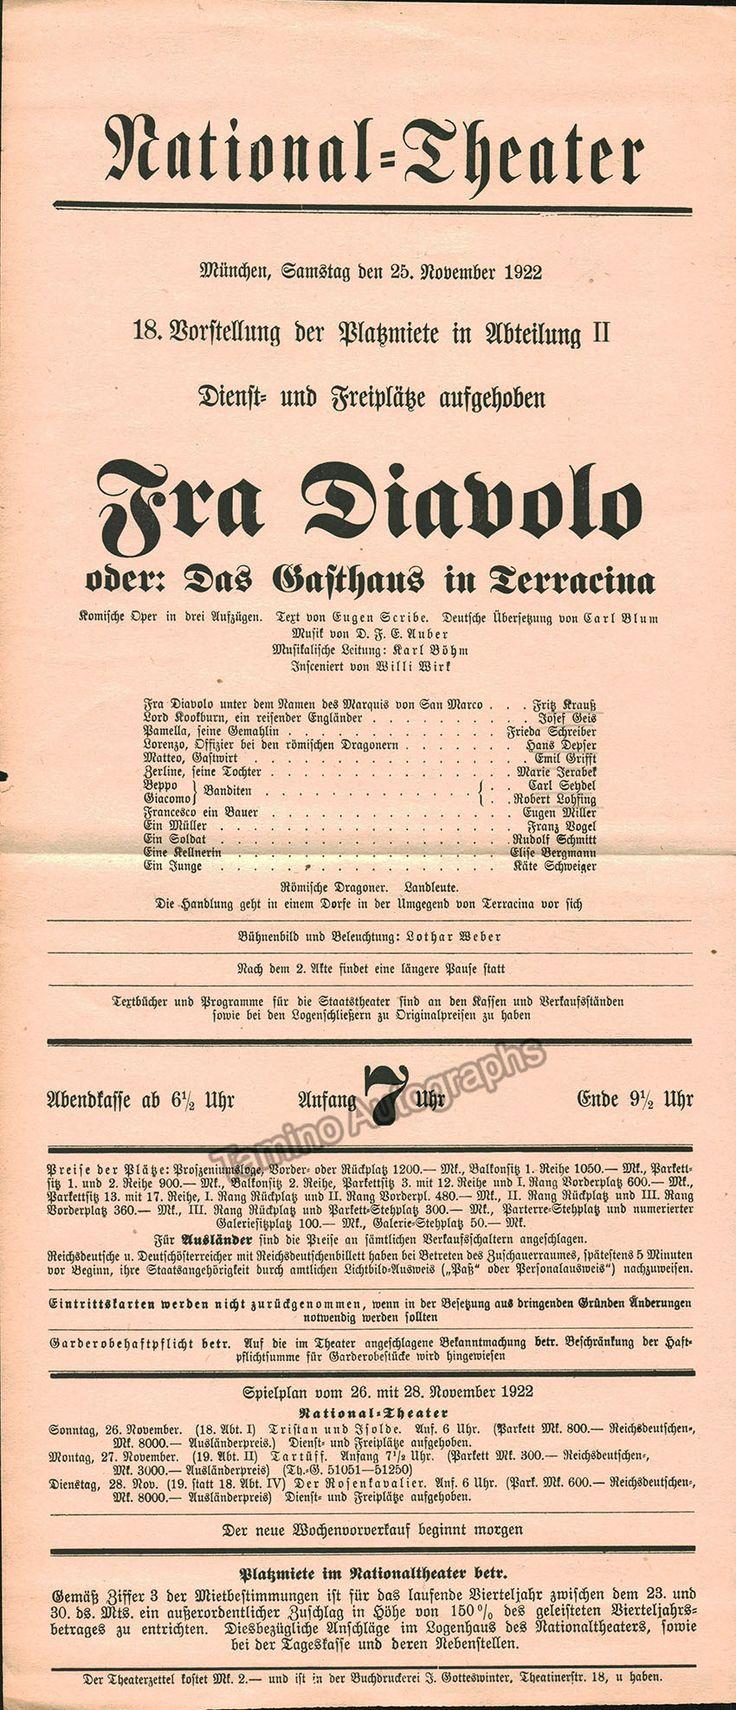 Bohm, Karl - Munich Playbill Fra Diavolo 1922